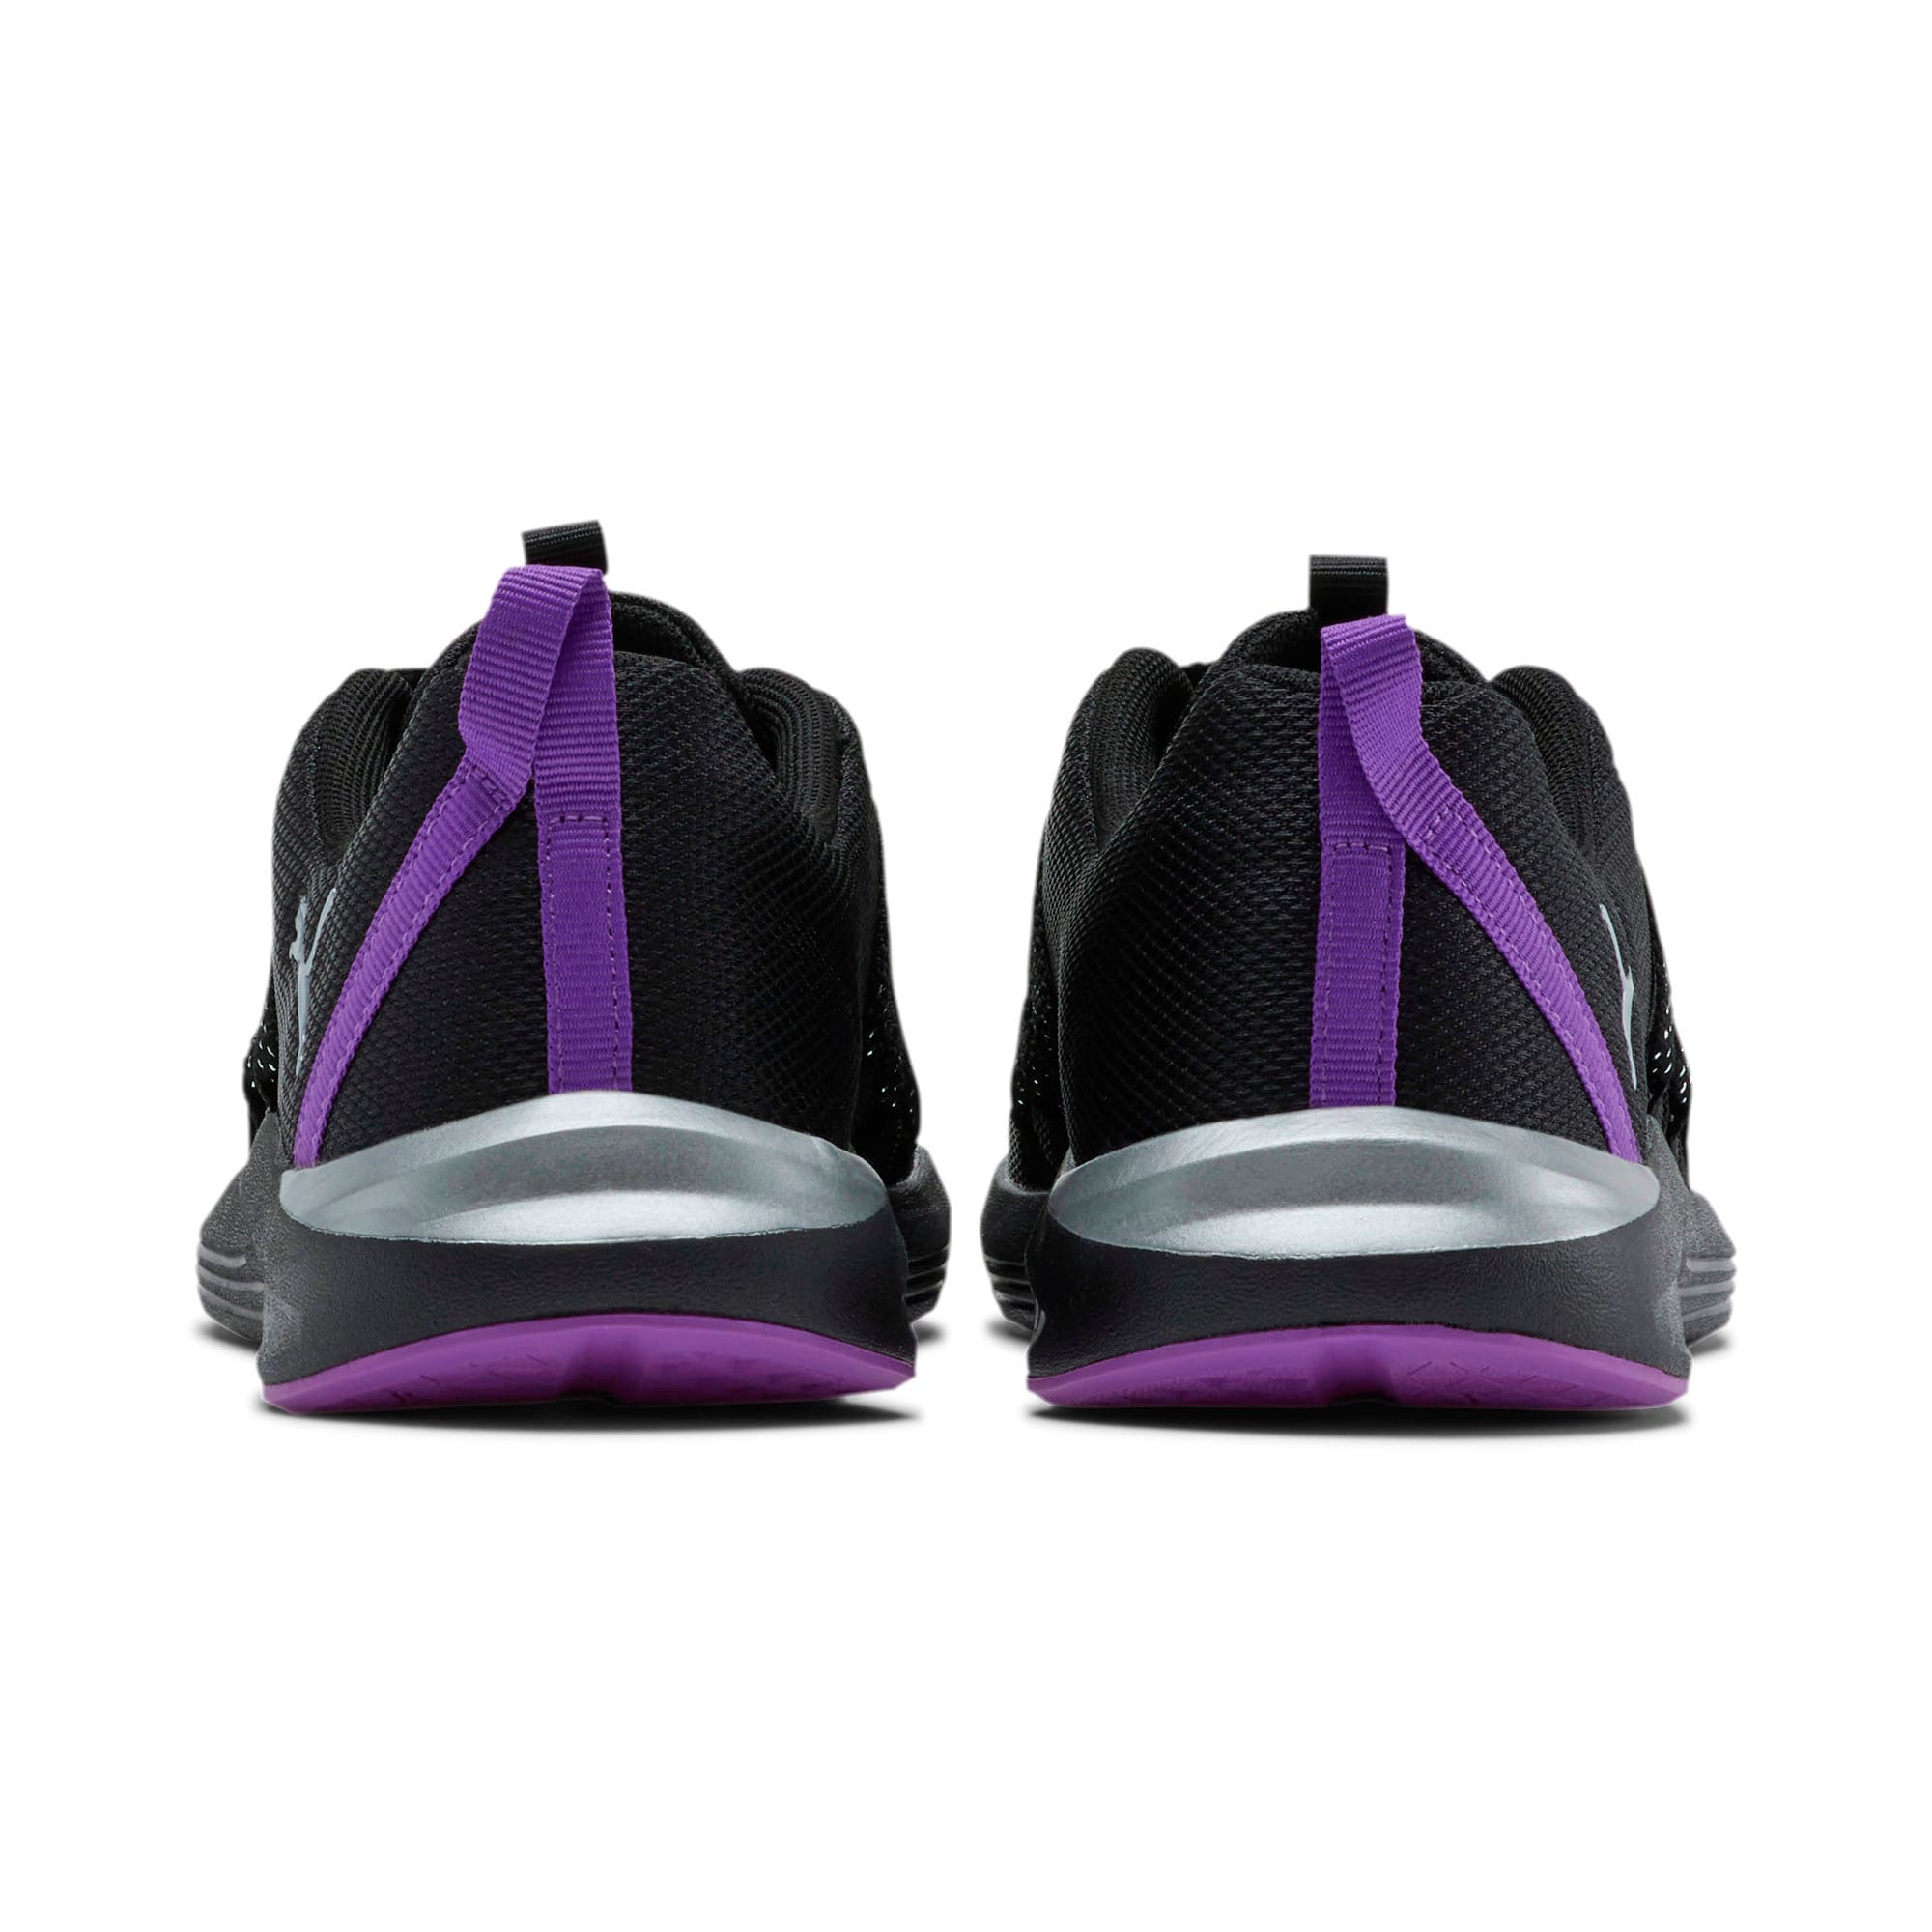 Thumbnail 4 of Prowl Alt Metal Women's Training Shoes, Puma Black-Purple Glimmer, medium